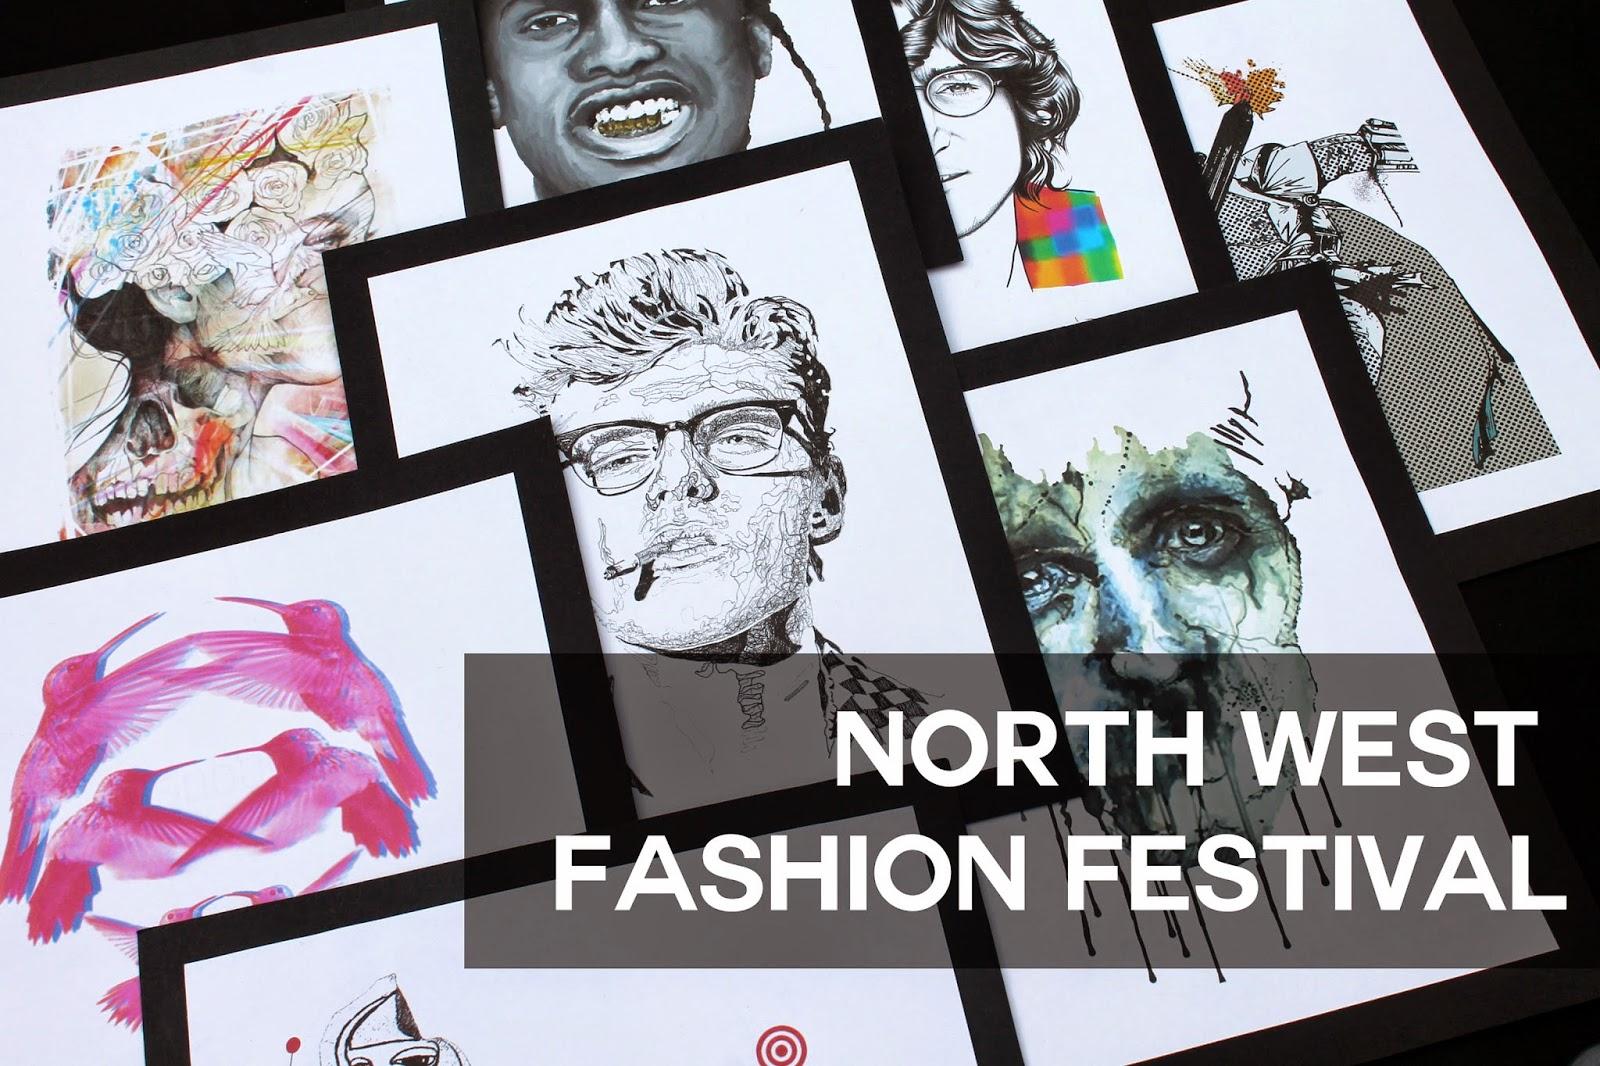 north west fashion festival, tee co art prints